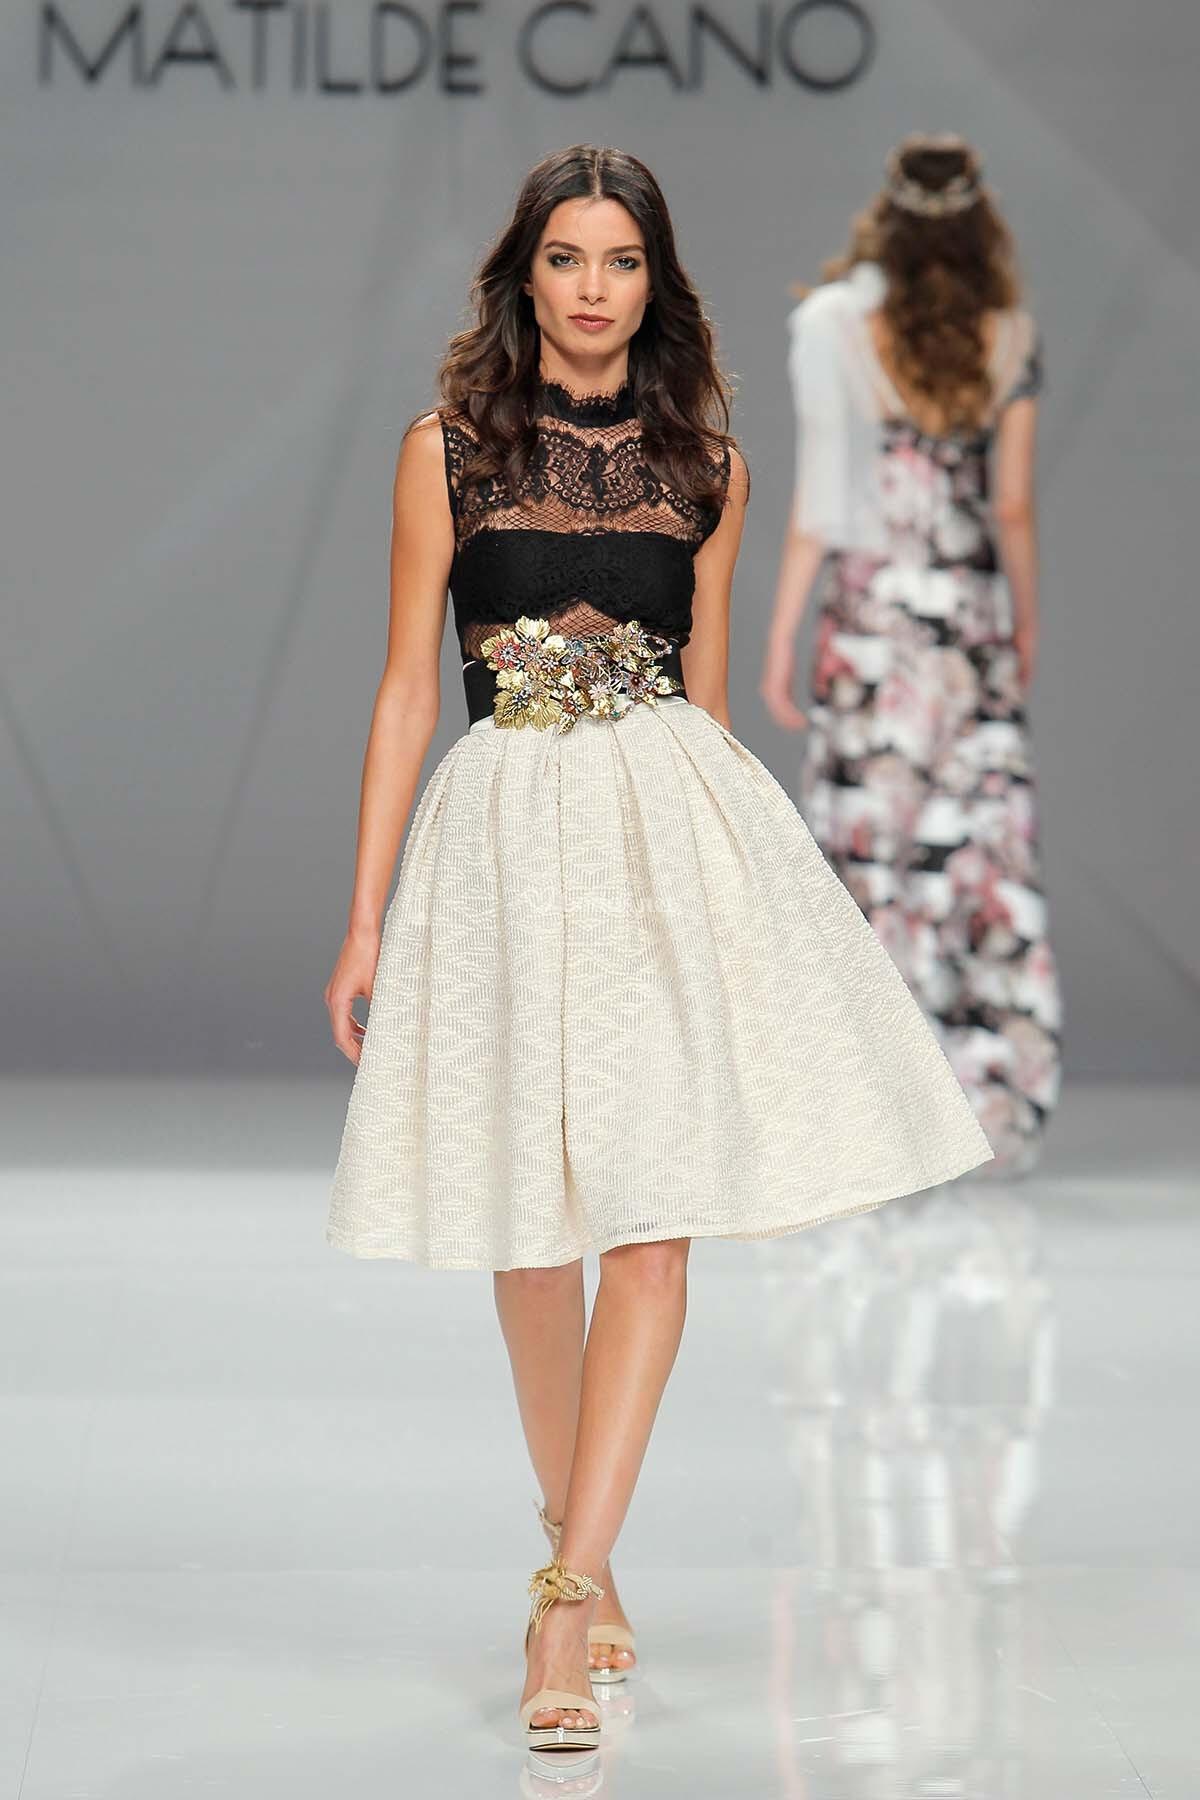 0b545190d Vestido de Fiesta de Matilde Cano - MC 20